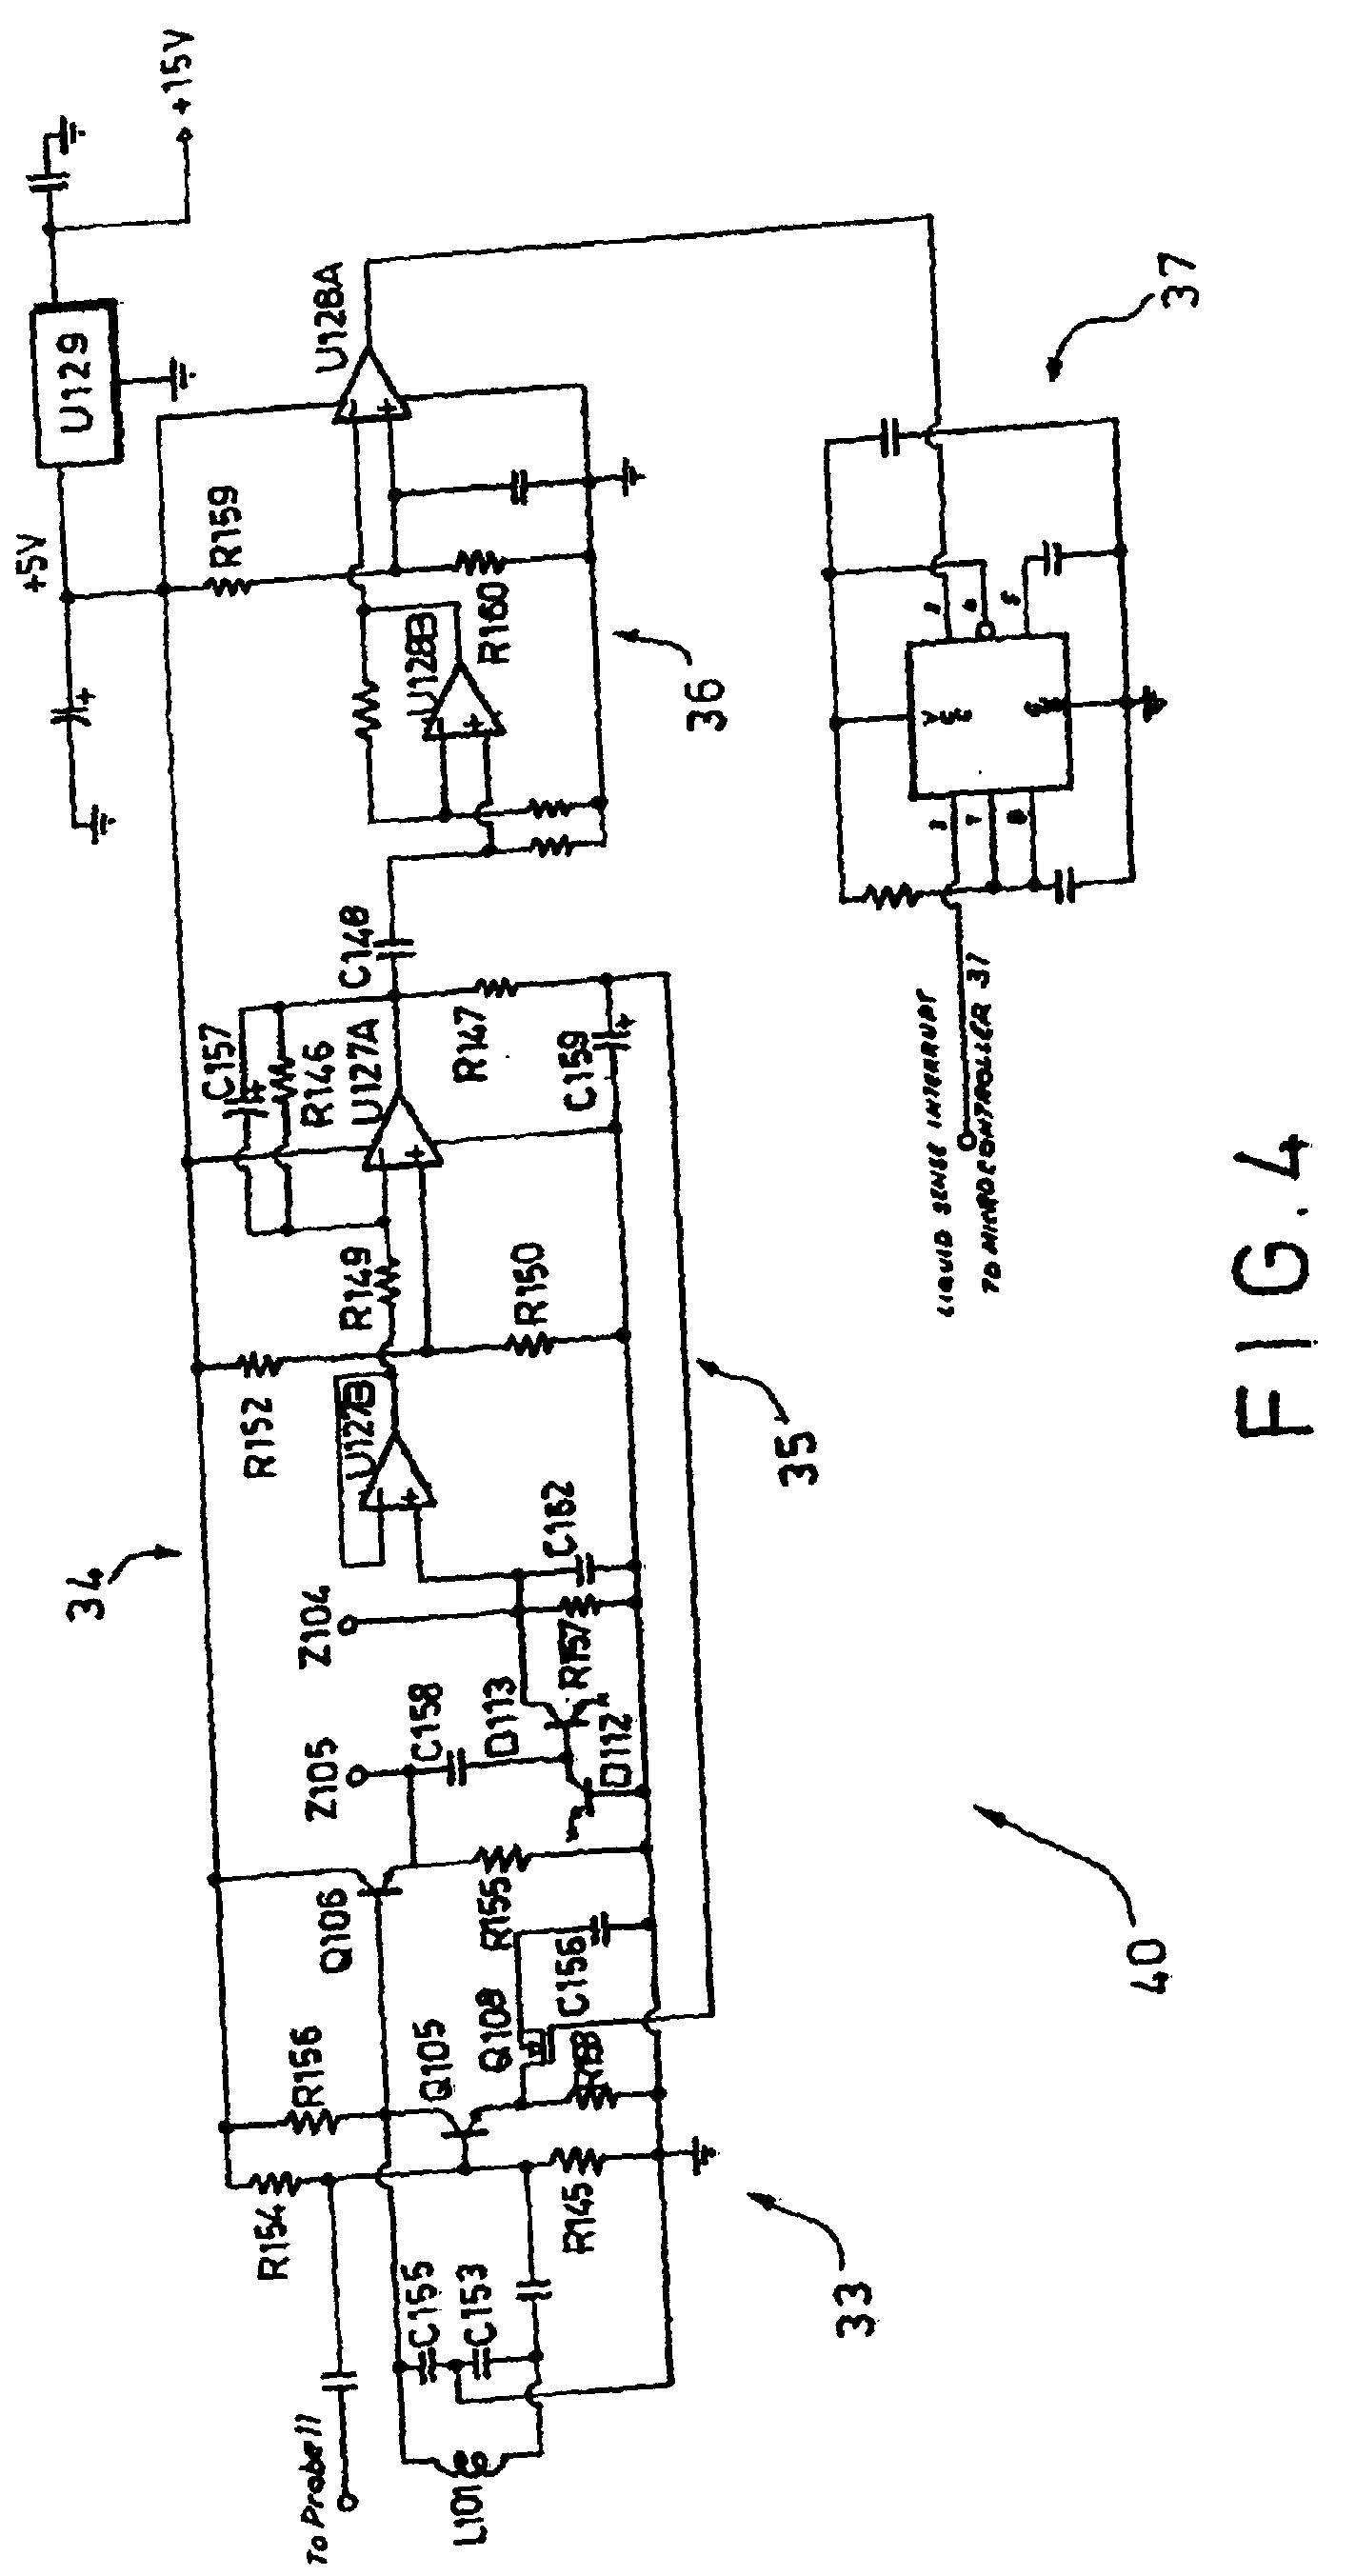 motor wiring diagram on wiring diagram besides 460 volt single phase